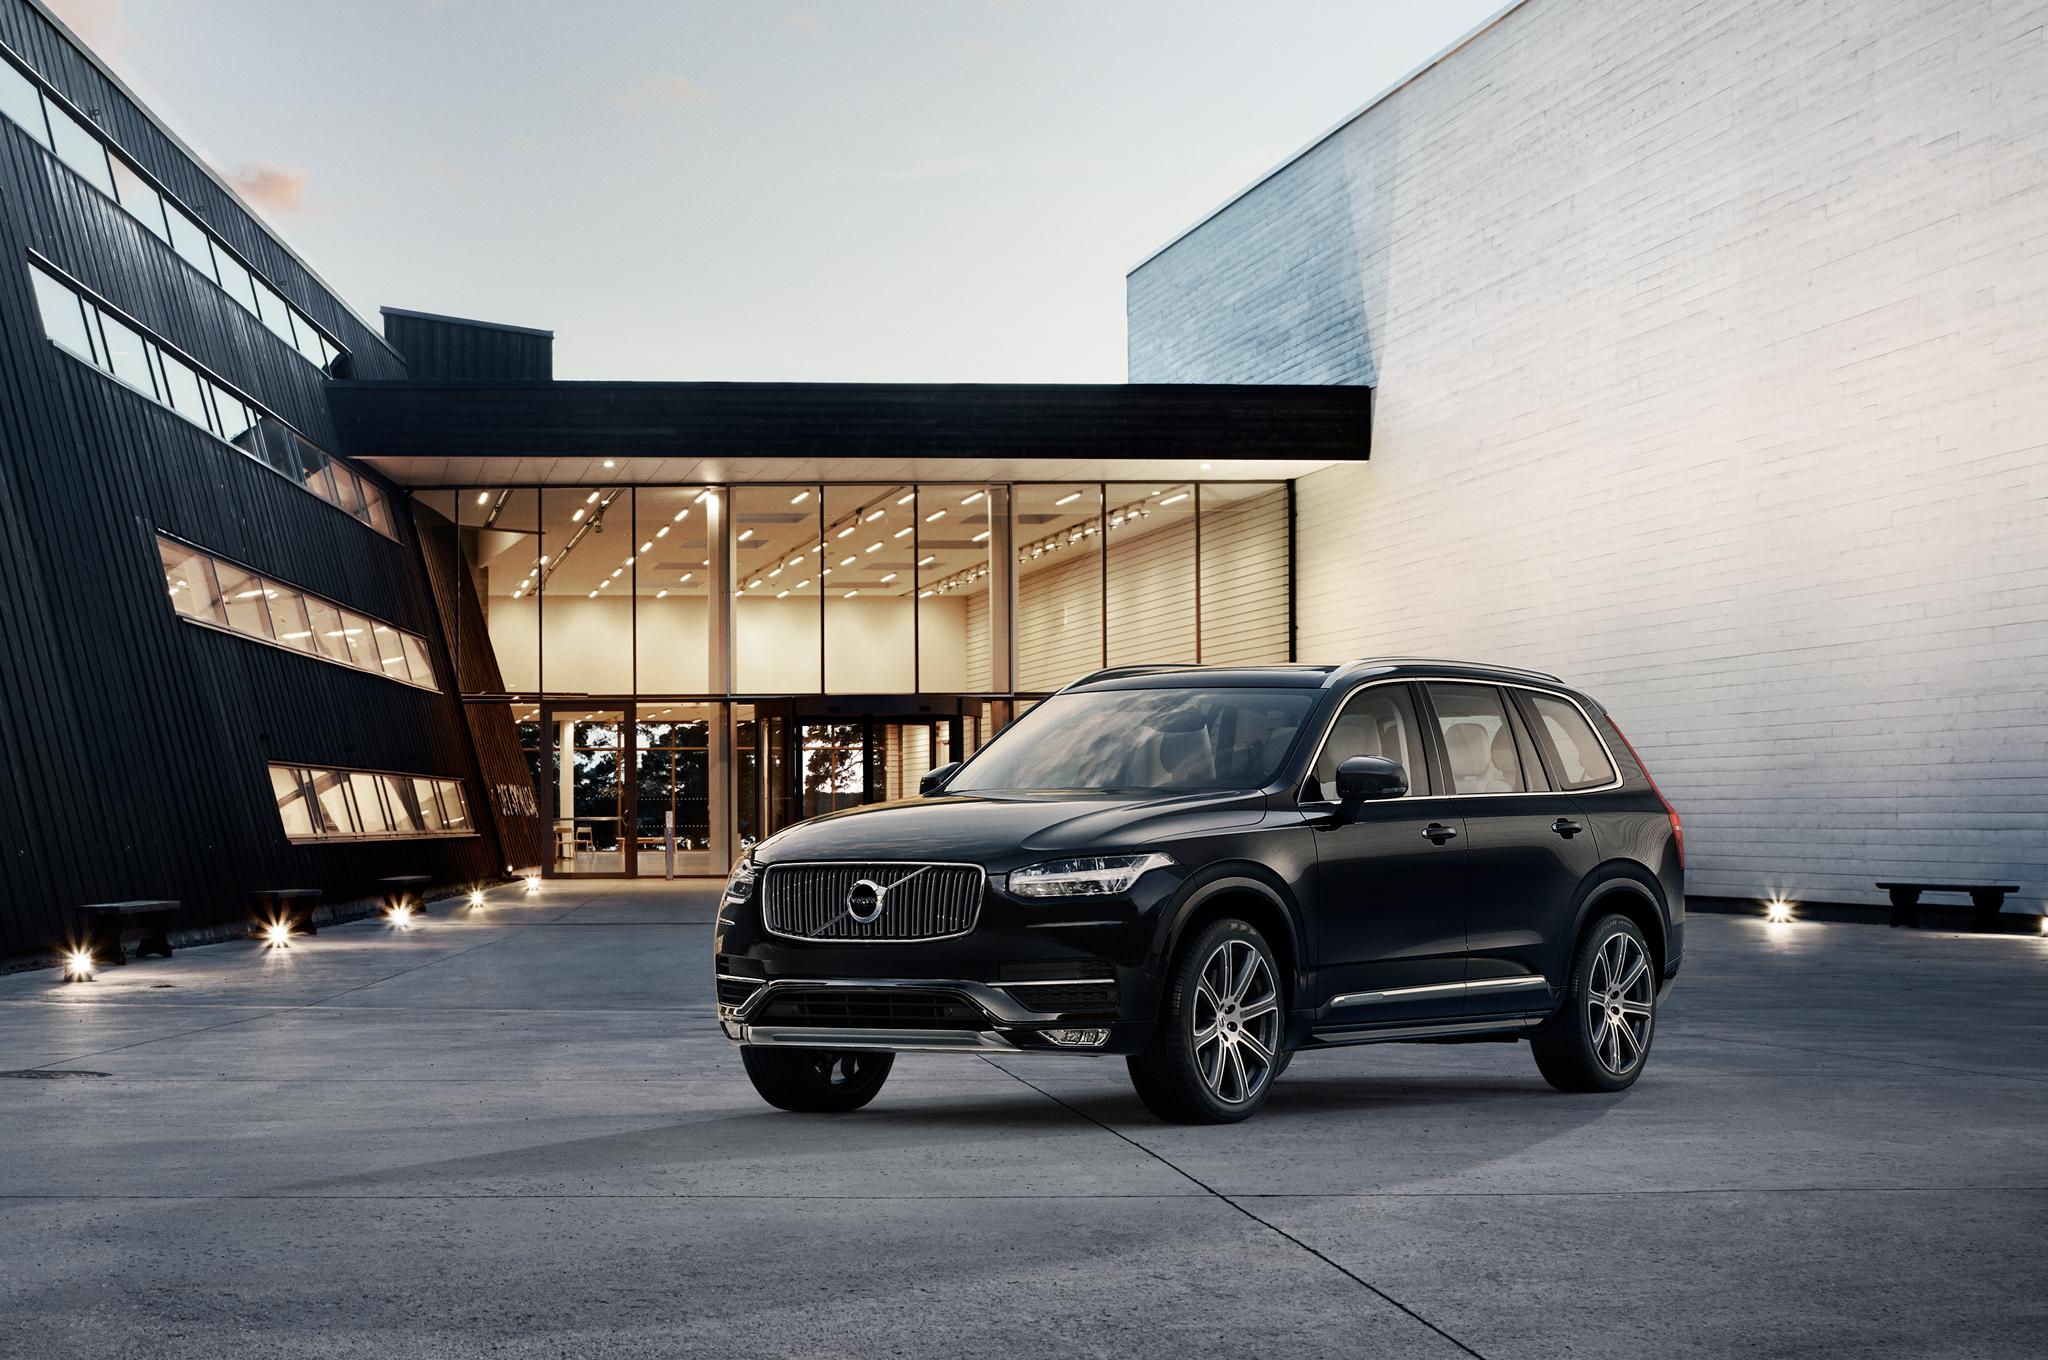 Delightful 2 Companies Fighting Over Volvo Dealership